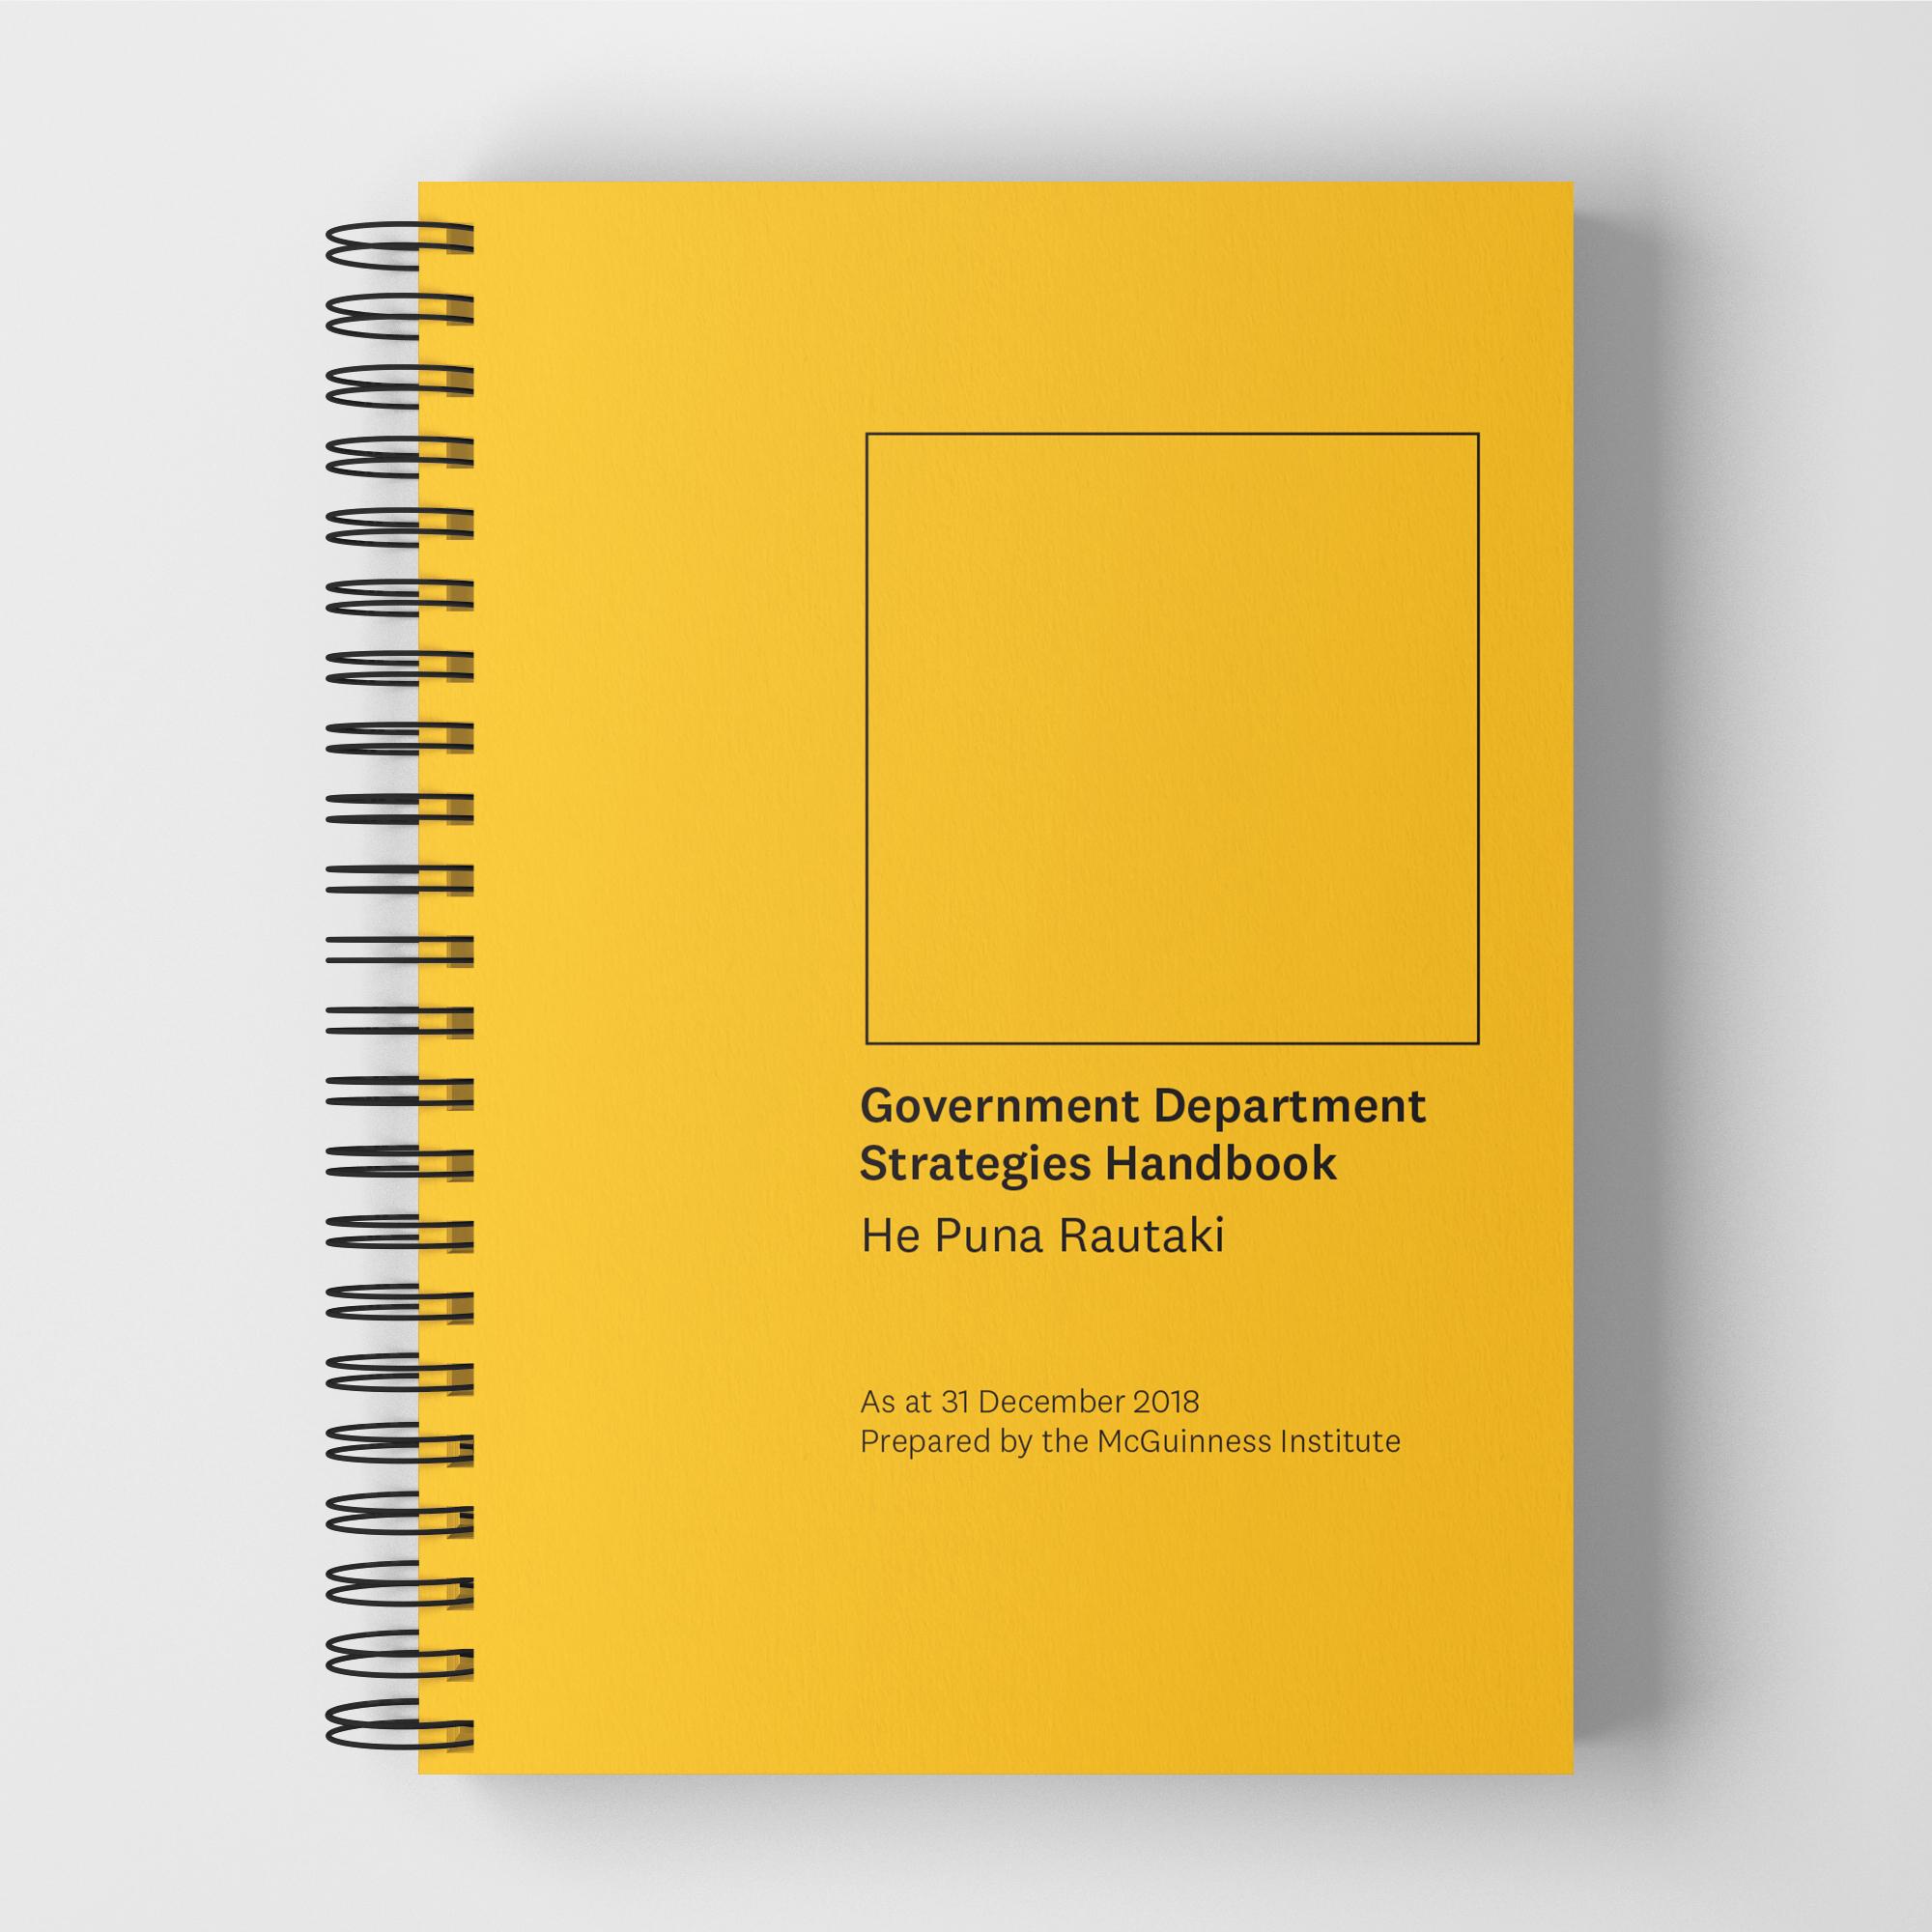 GDS Index Handbook Image